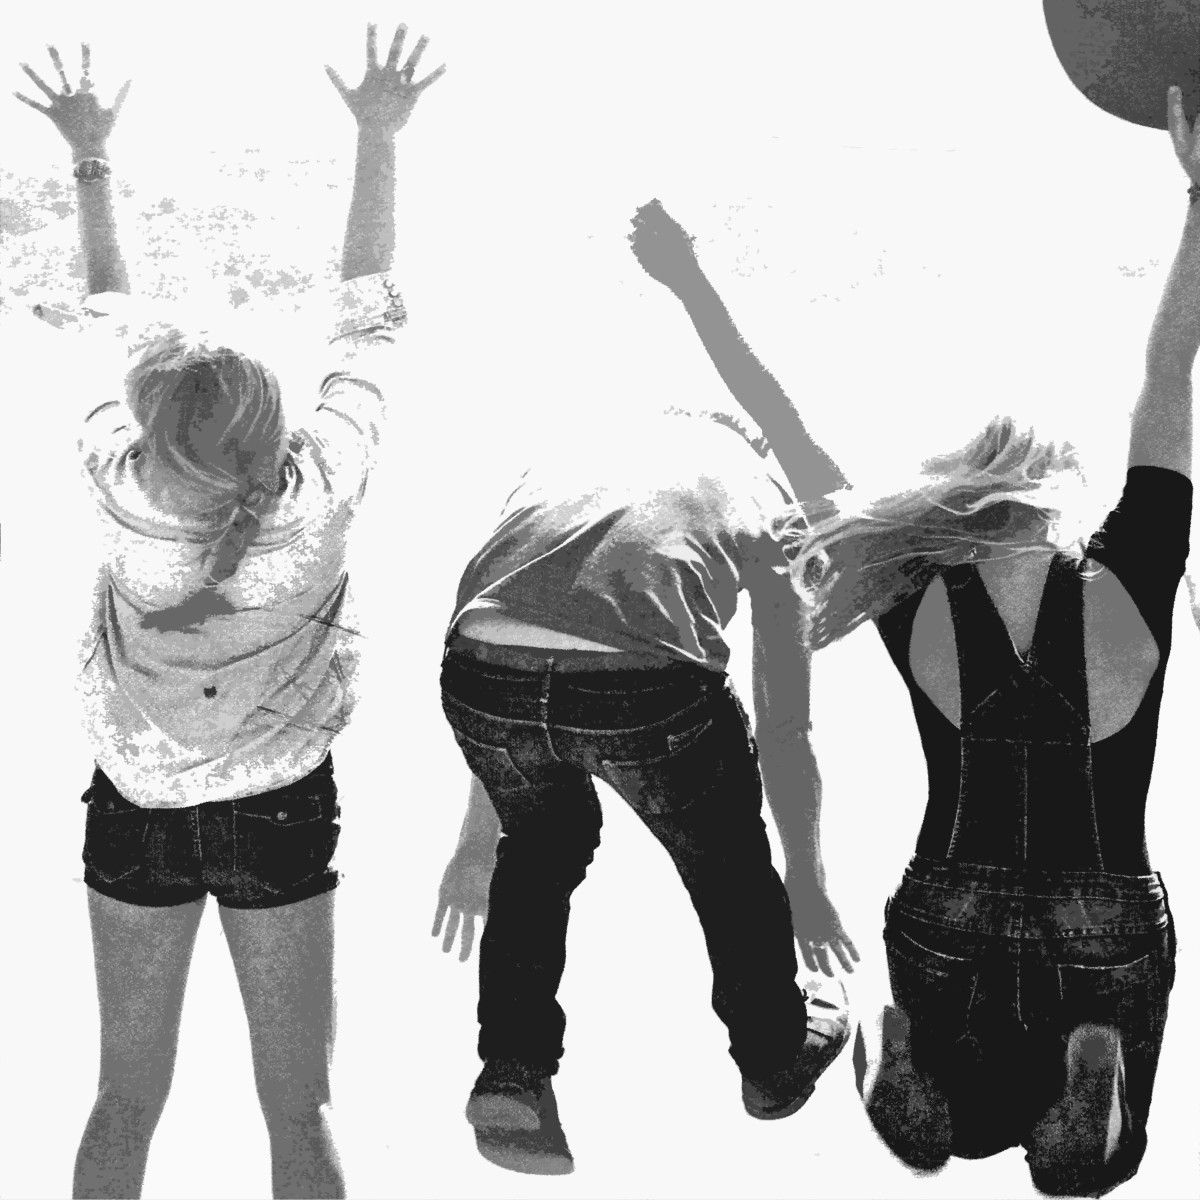 Jump for Joy edited by Gina Godfrey